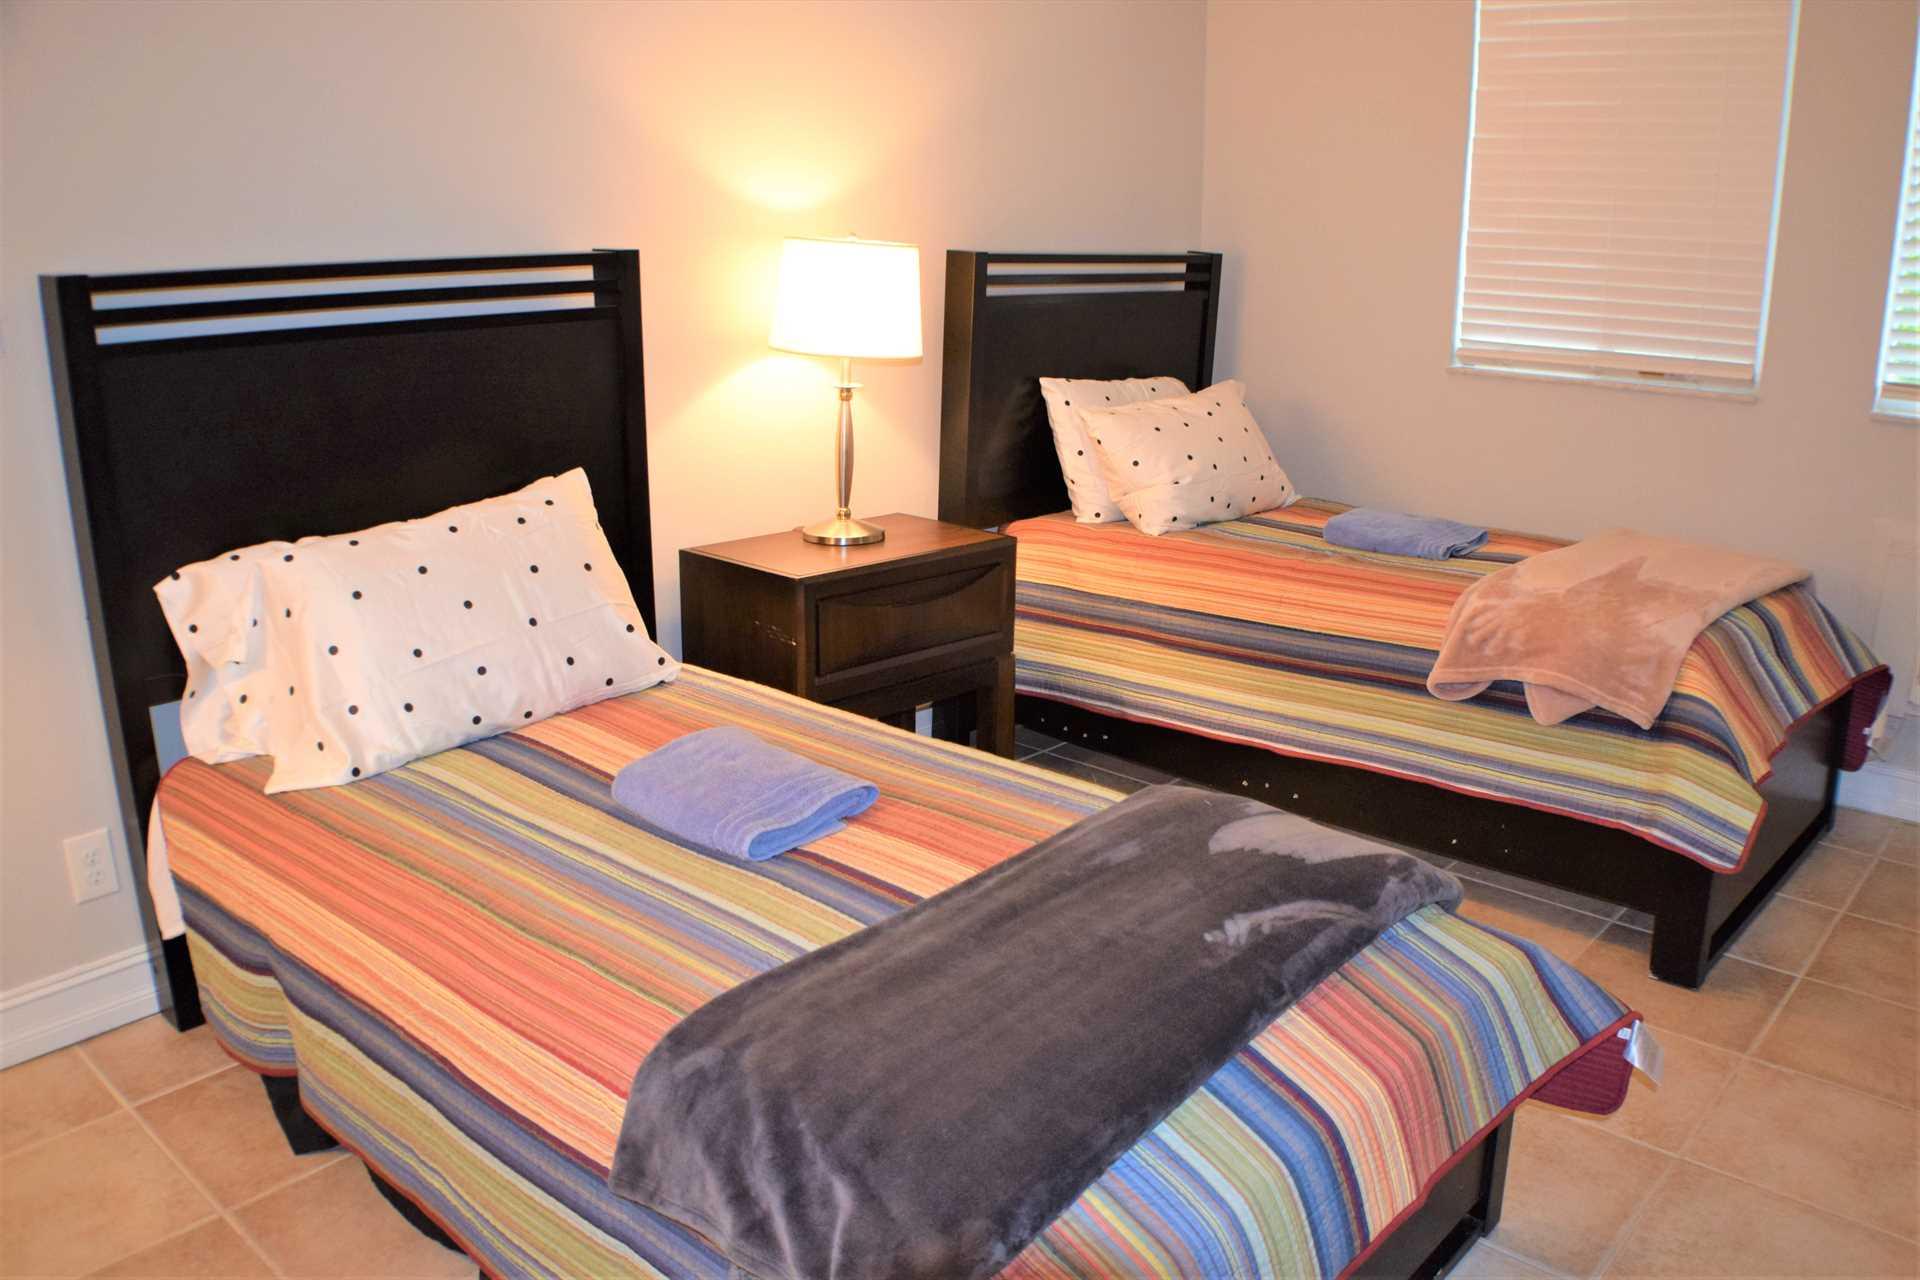 Second bedroom has twin beds.